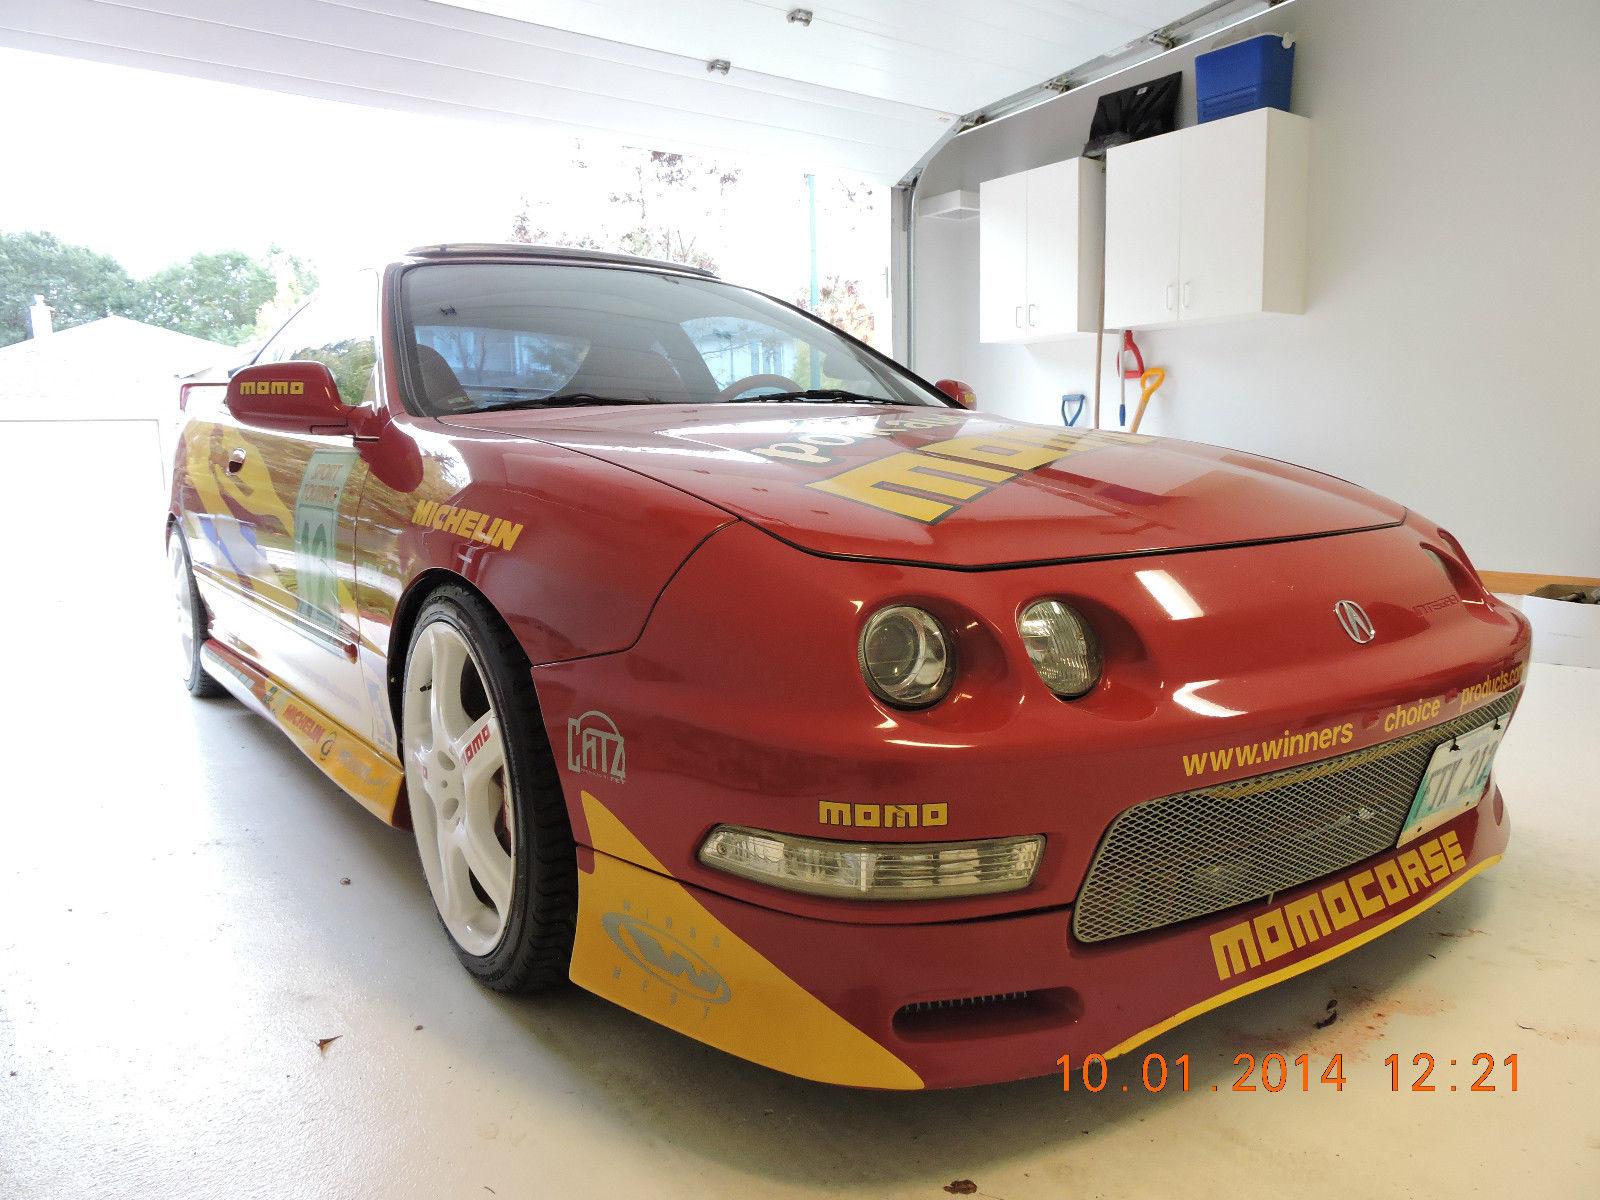 Integra Fast Furious on Fast And Furious Acura Integra